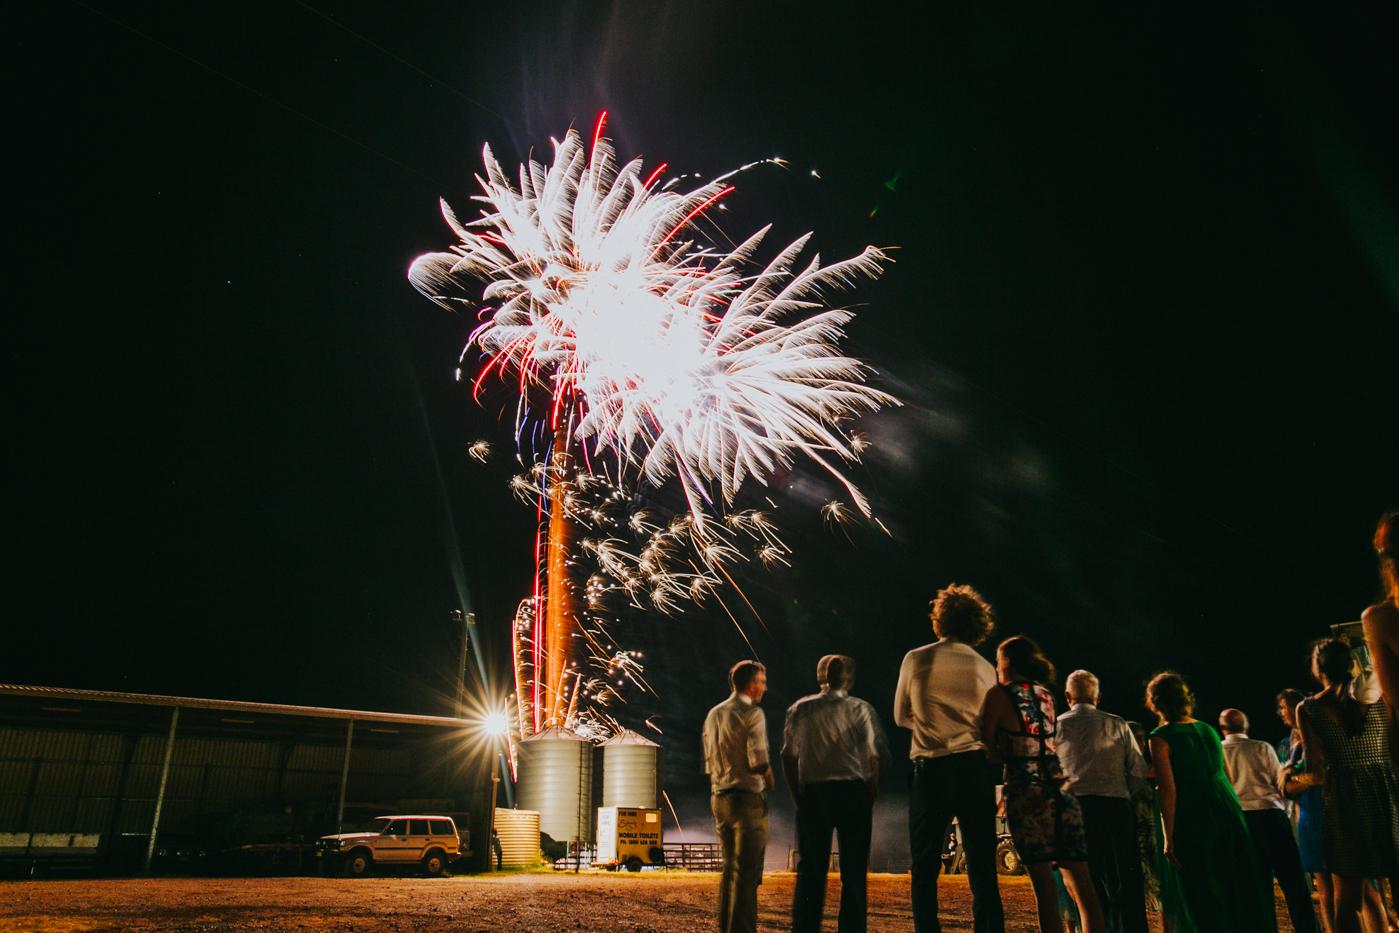 Nicolle & Jacob - Dubbo Wedding - Country Australia - Samantha Heather Photography-315.jpg